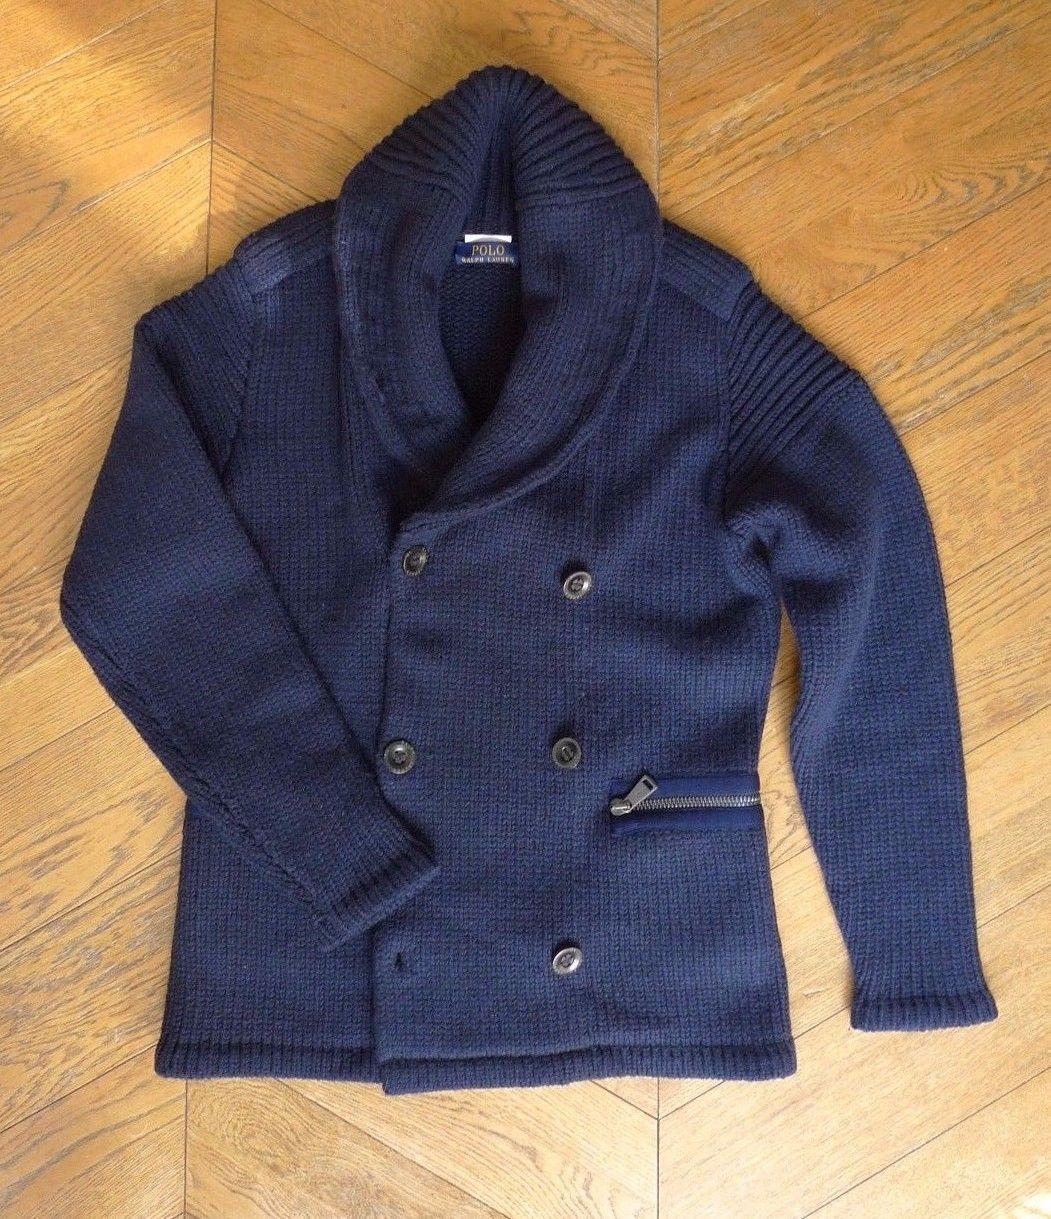 69d99f1ff031b4 Veste cardigan laine merinos - bleu marine - taille m - polo ralph lauren